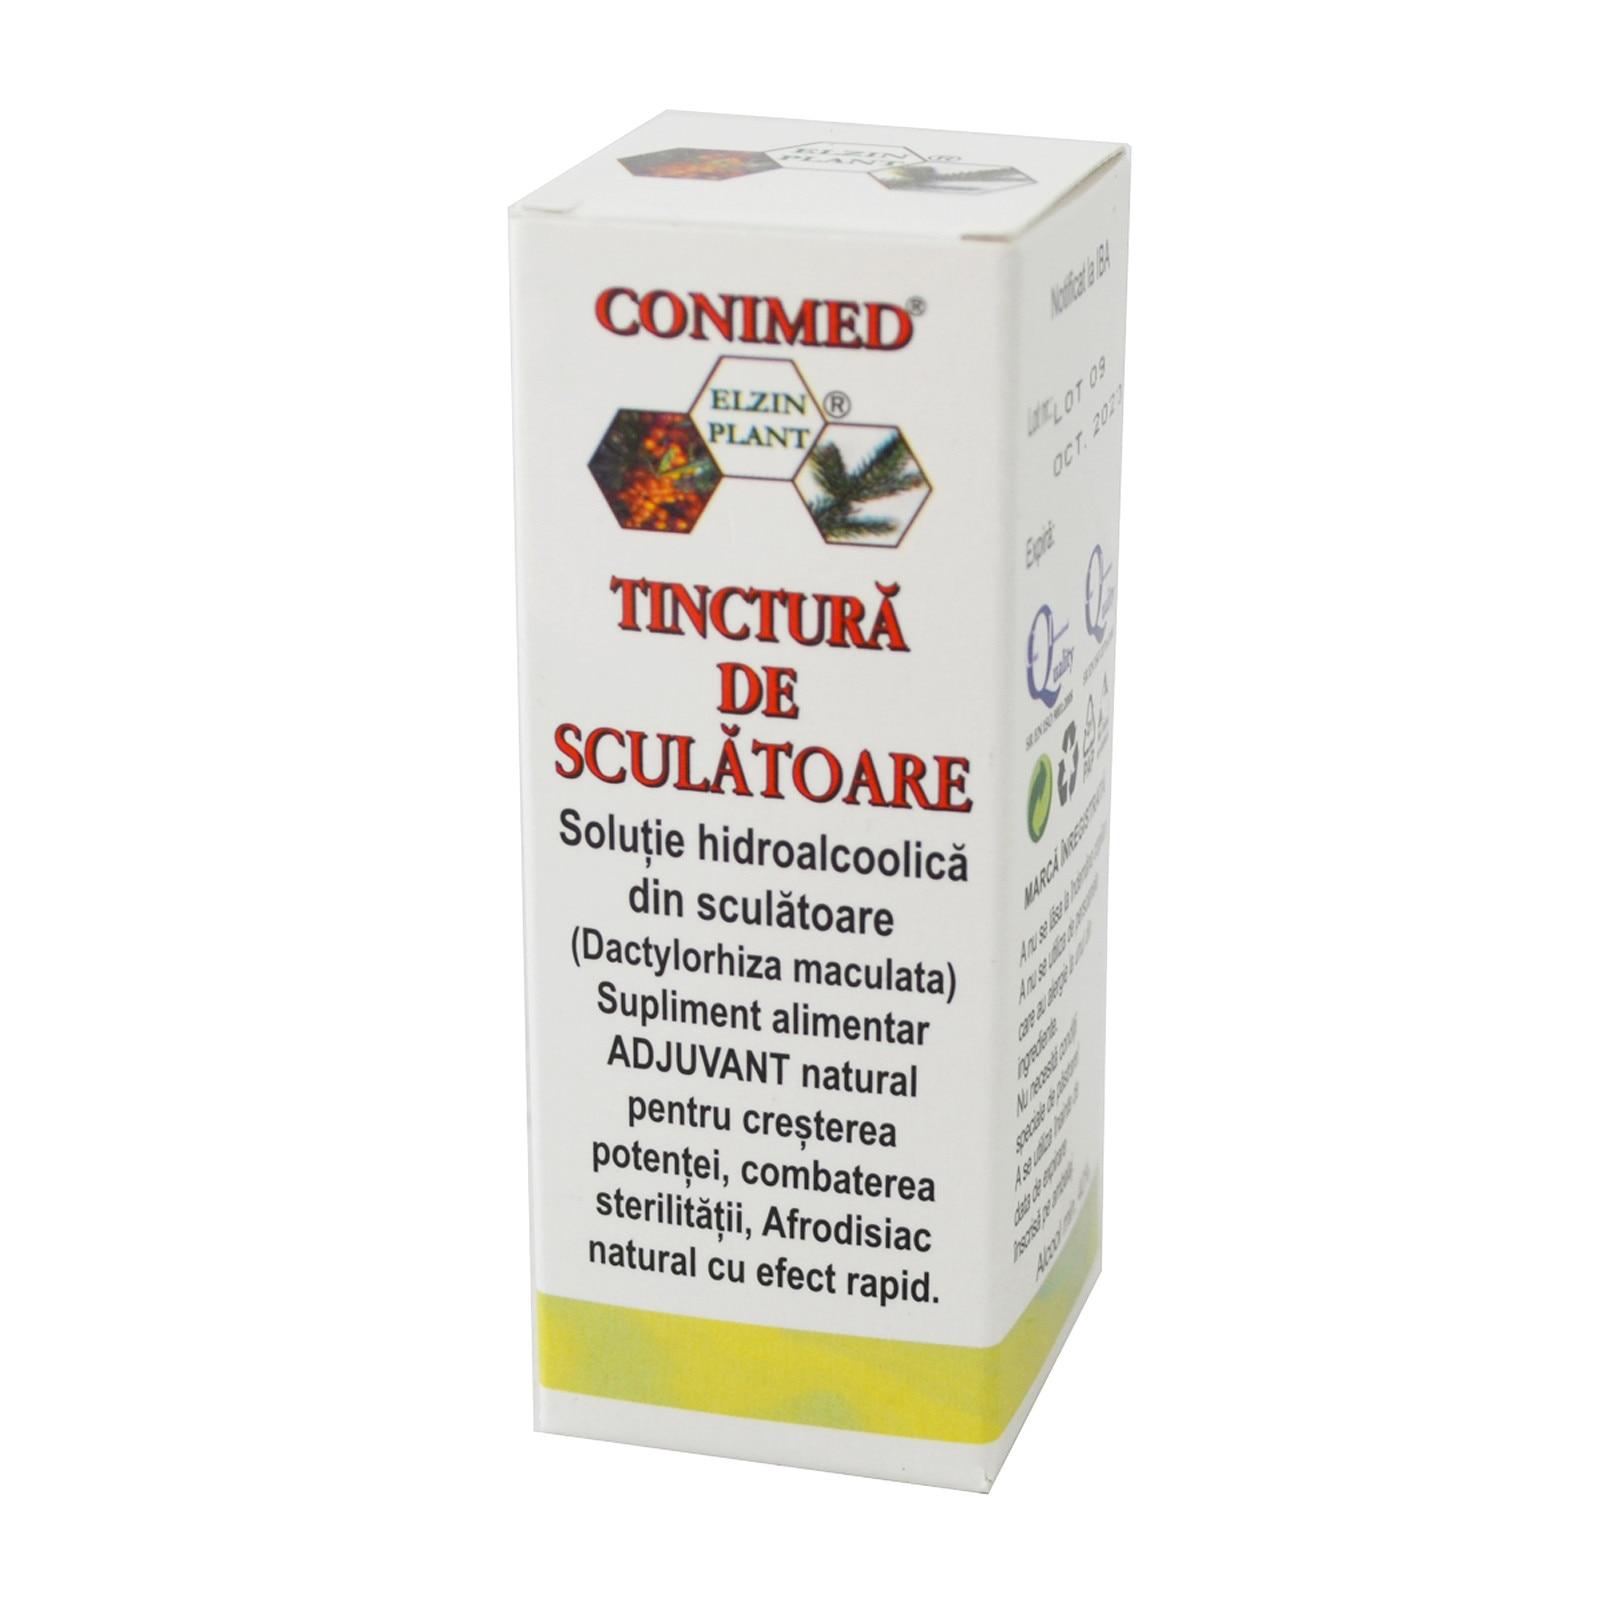 Tinctura Sculatoare - Elzinplant, 50 ml (Pentru EL) - alaskanmalamutes.ro